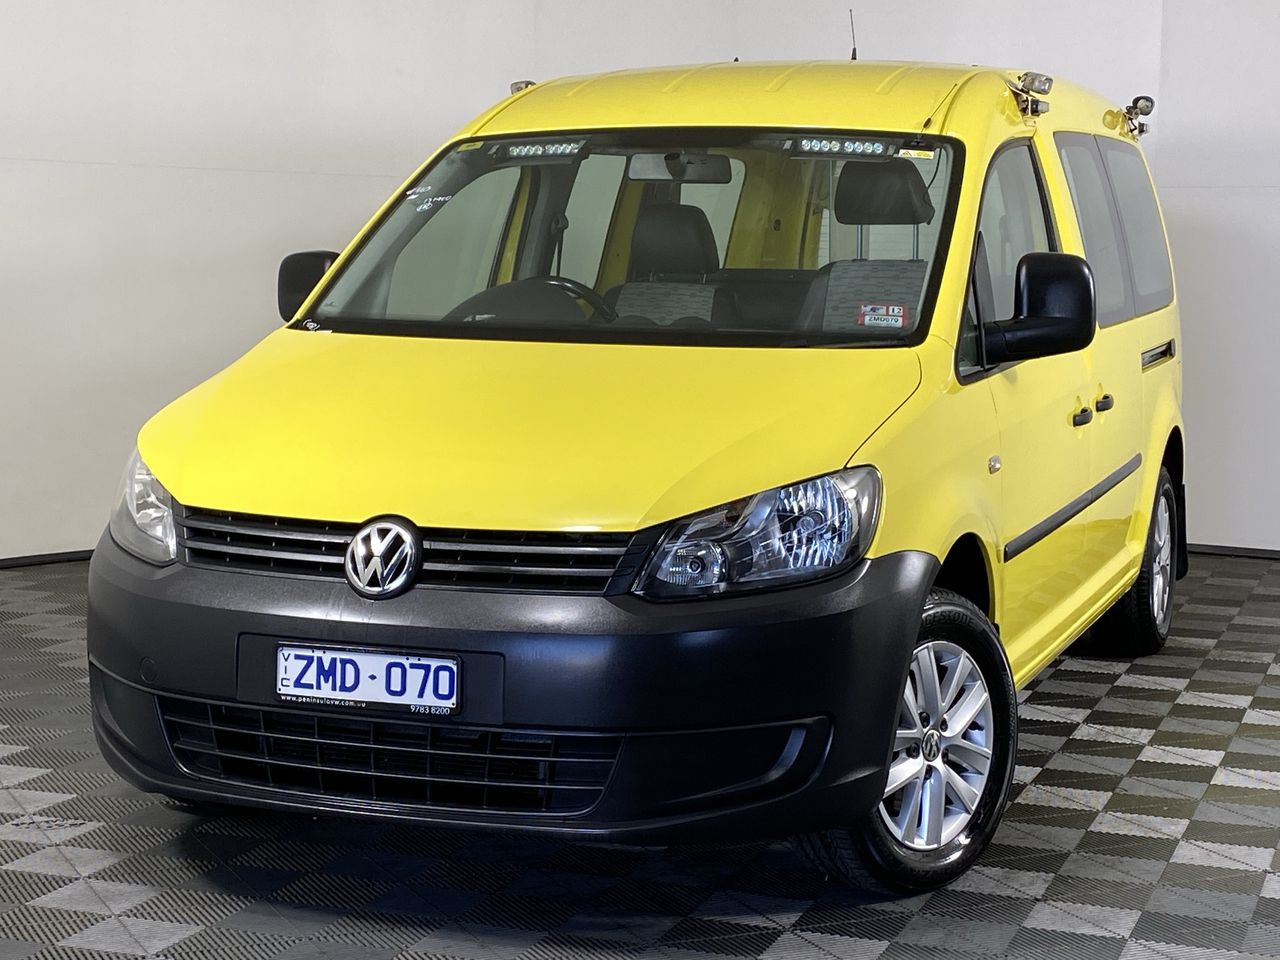 2012 Volkswagen CADDY Turbo Diesel Automatic Van (EX RACV)